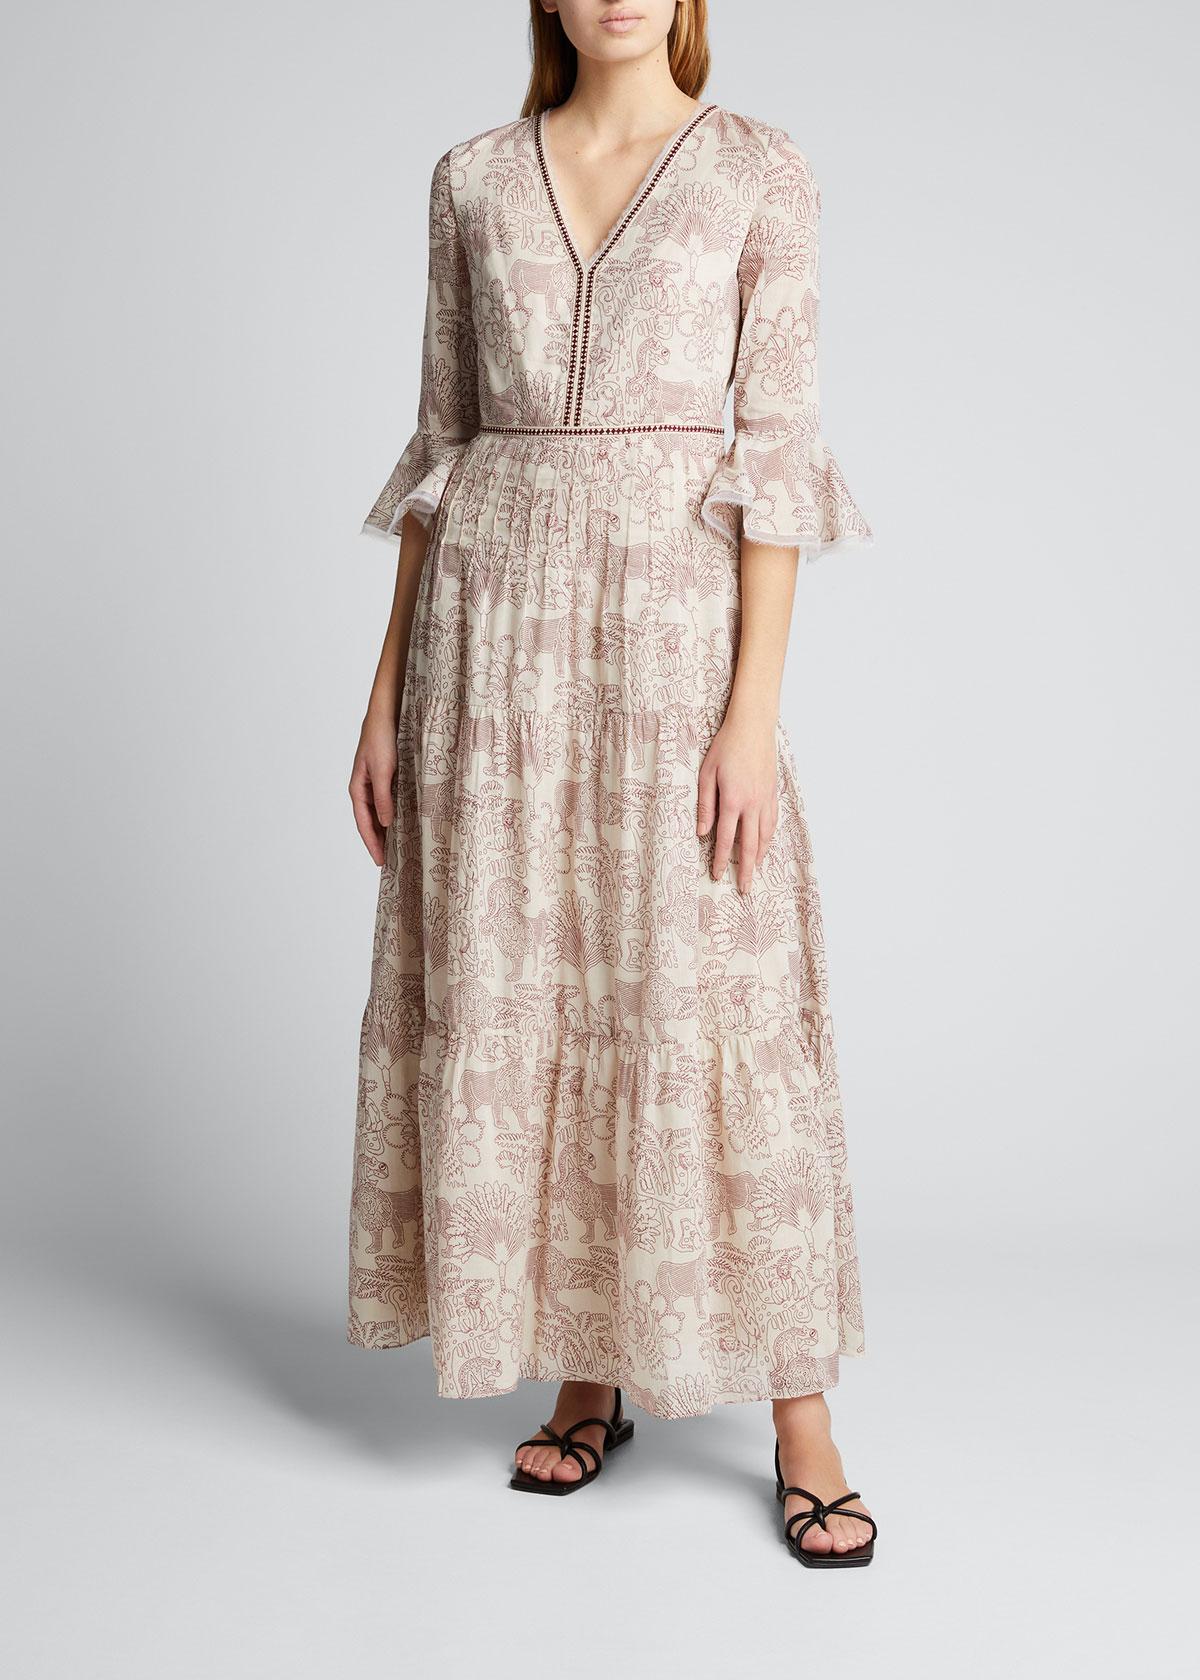 Le Sirenuse Clothing BELLA LION & MONKEY TIERED DRESS